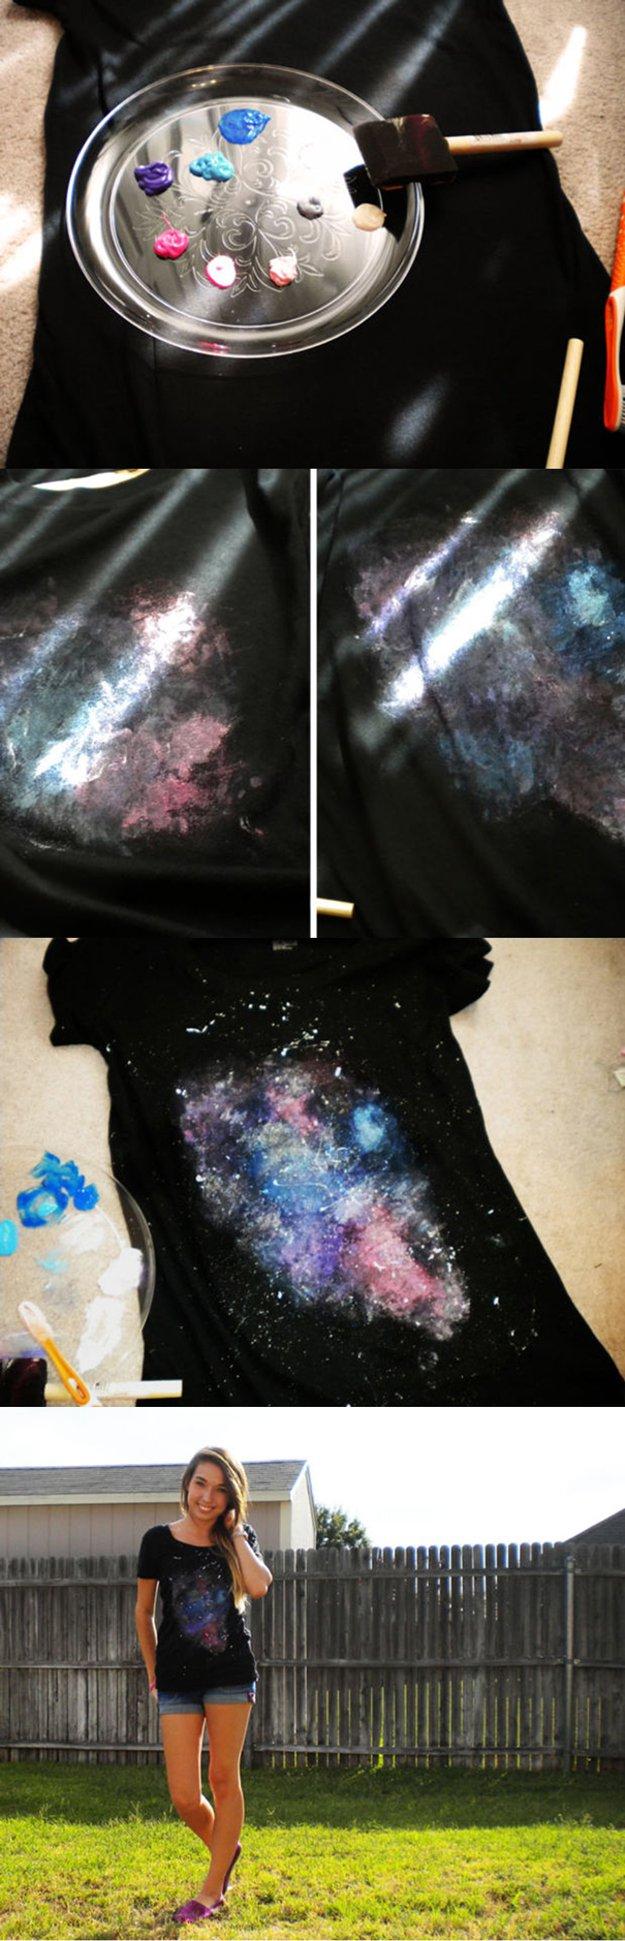 diy nebula shirt - photo #8